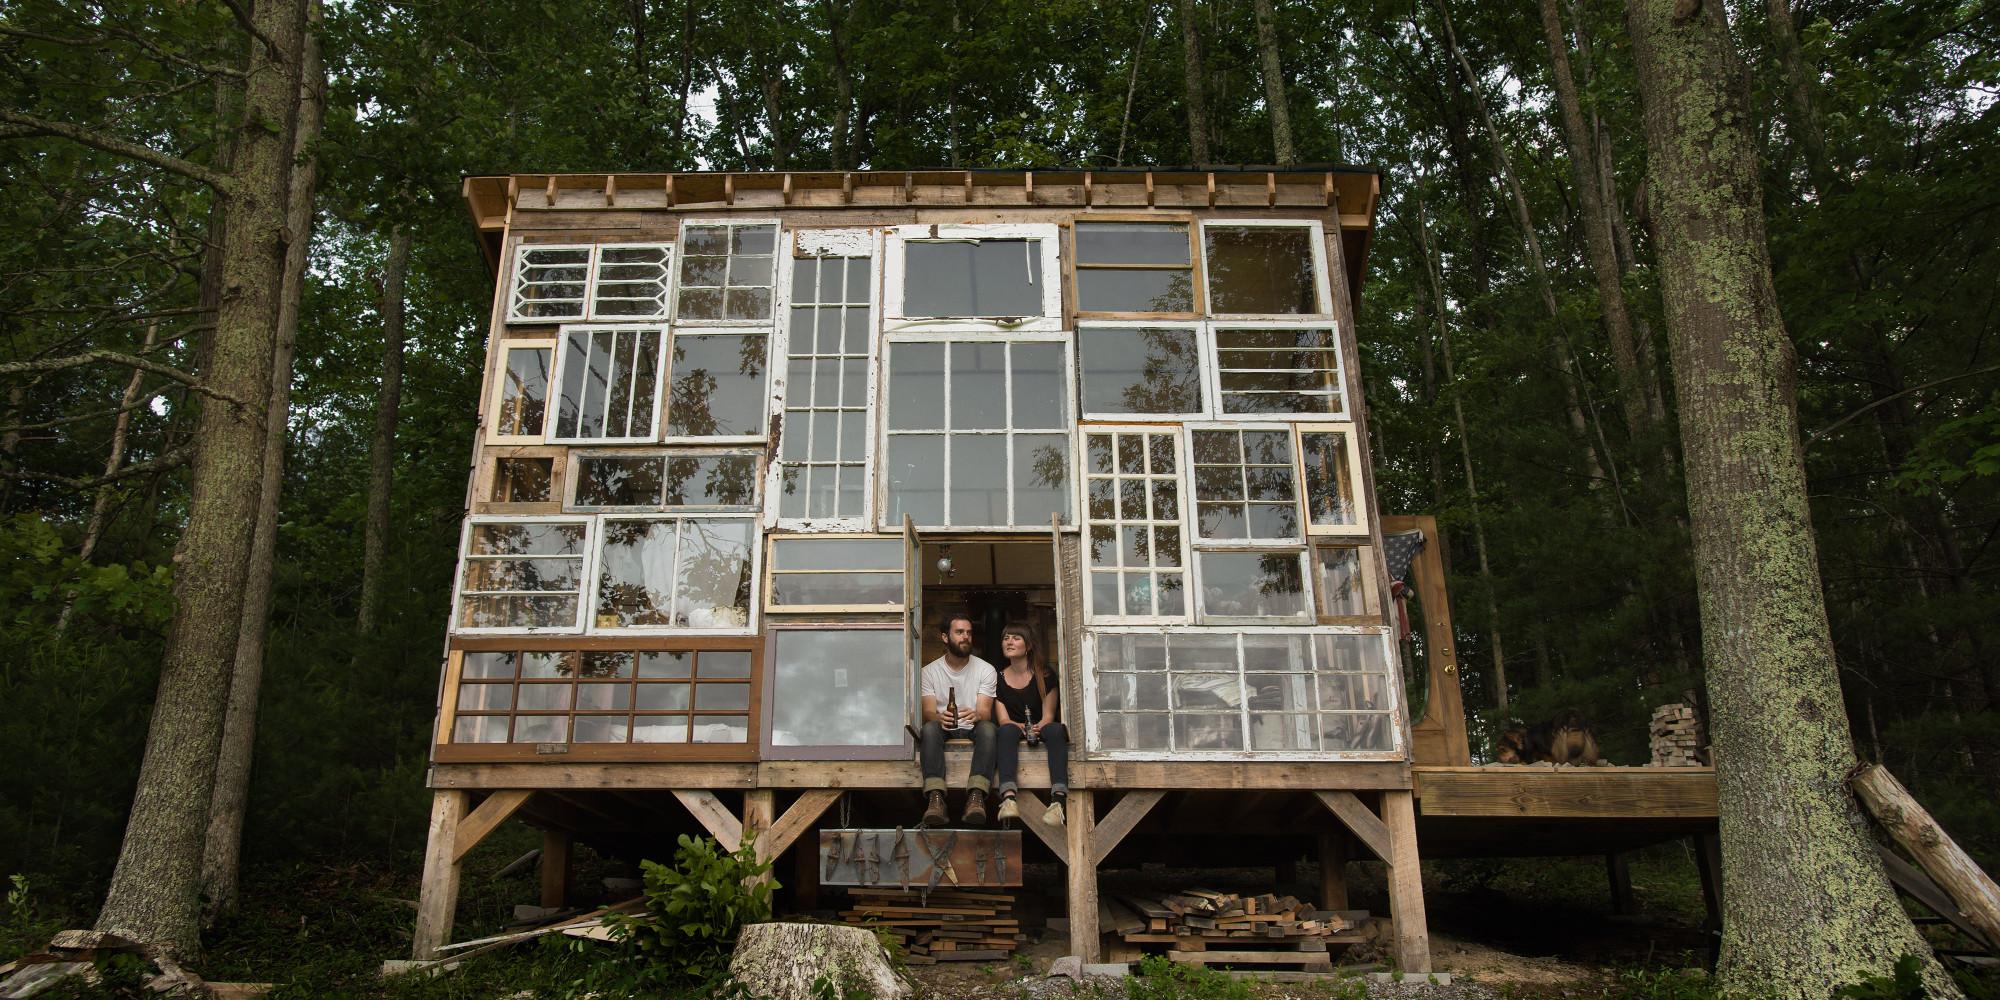 Beautiful Repurposed Home Decorating Ideas Images - Liltigertoo ...